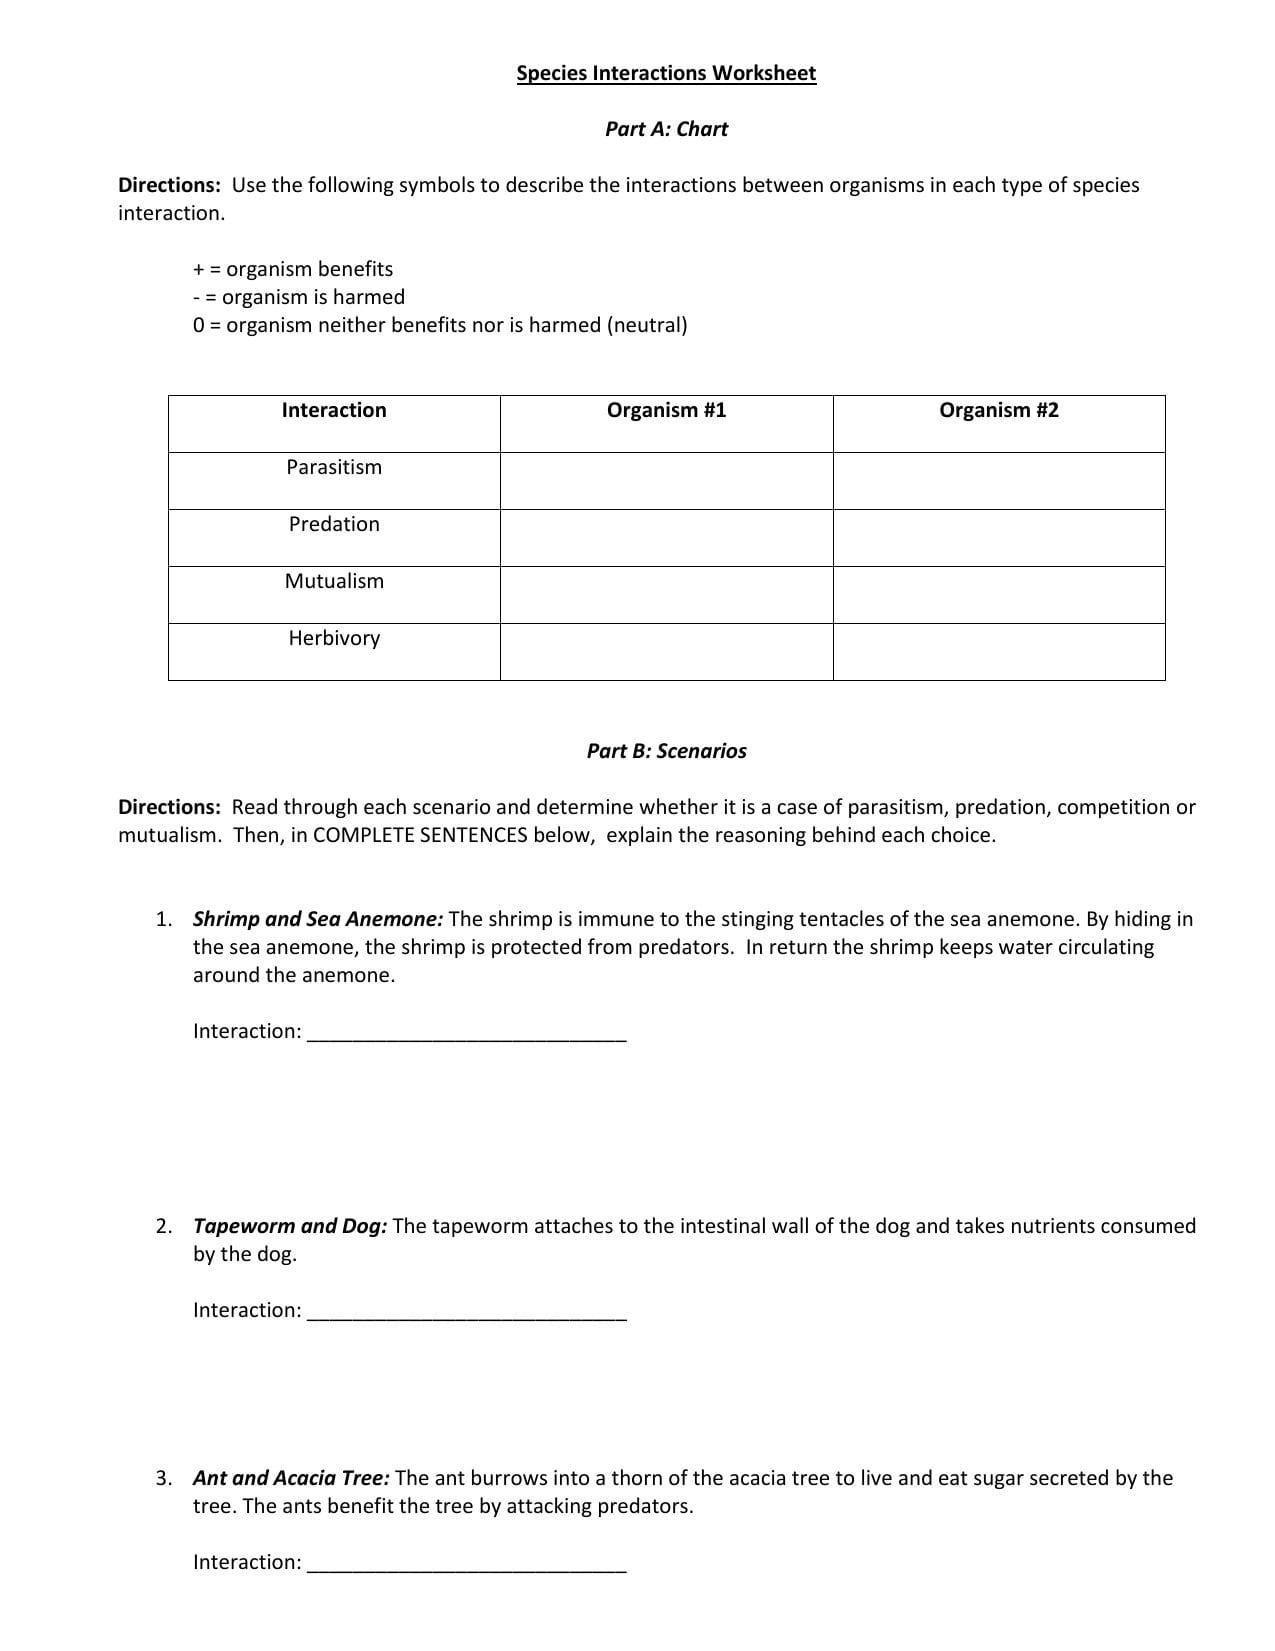 Species Interaction Worksheet Or Species Interactions Worksheet Answers